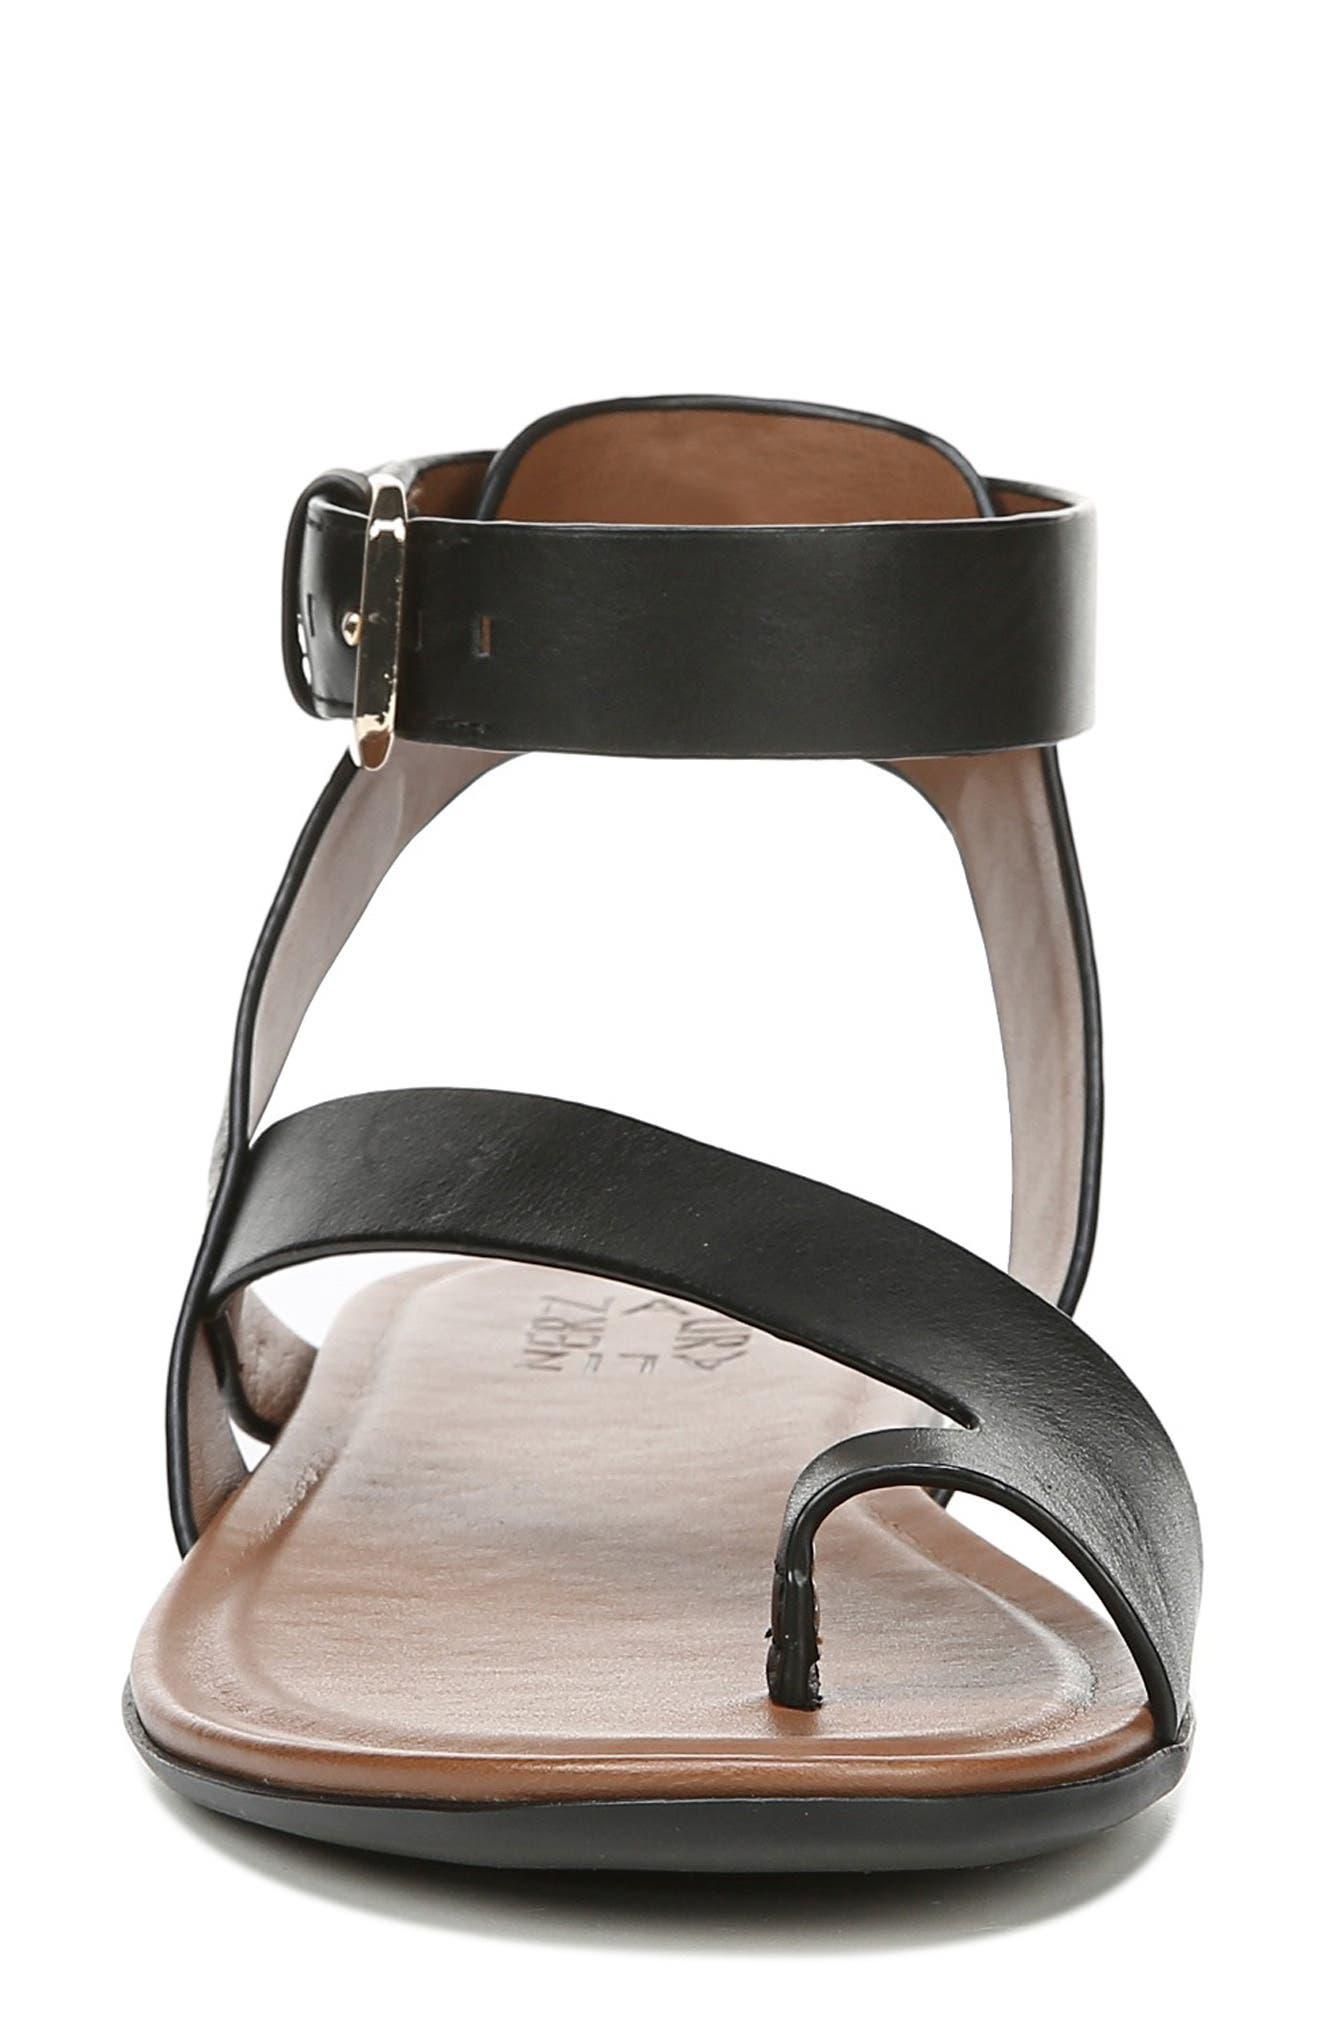 Tally Ankle Strap Sandal,                             Alternate thumbnail 4, color,                             BLACK LEATHER